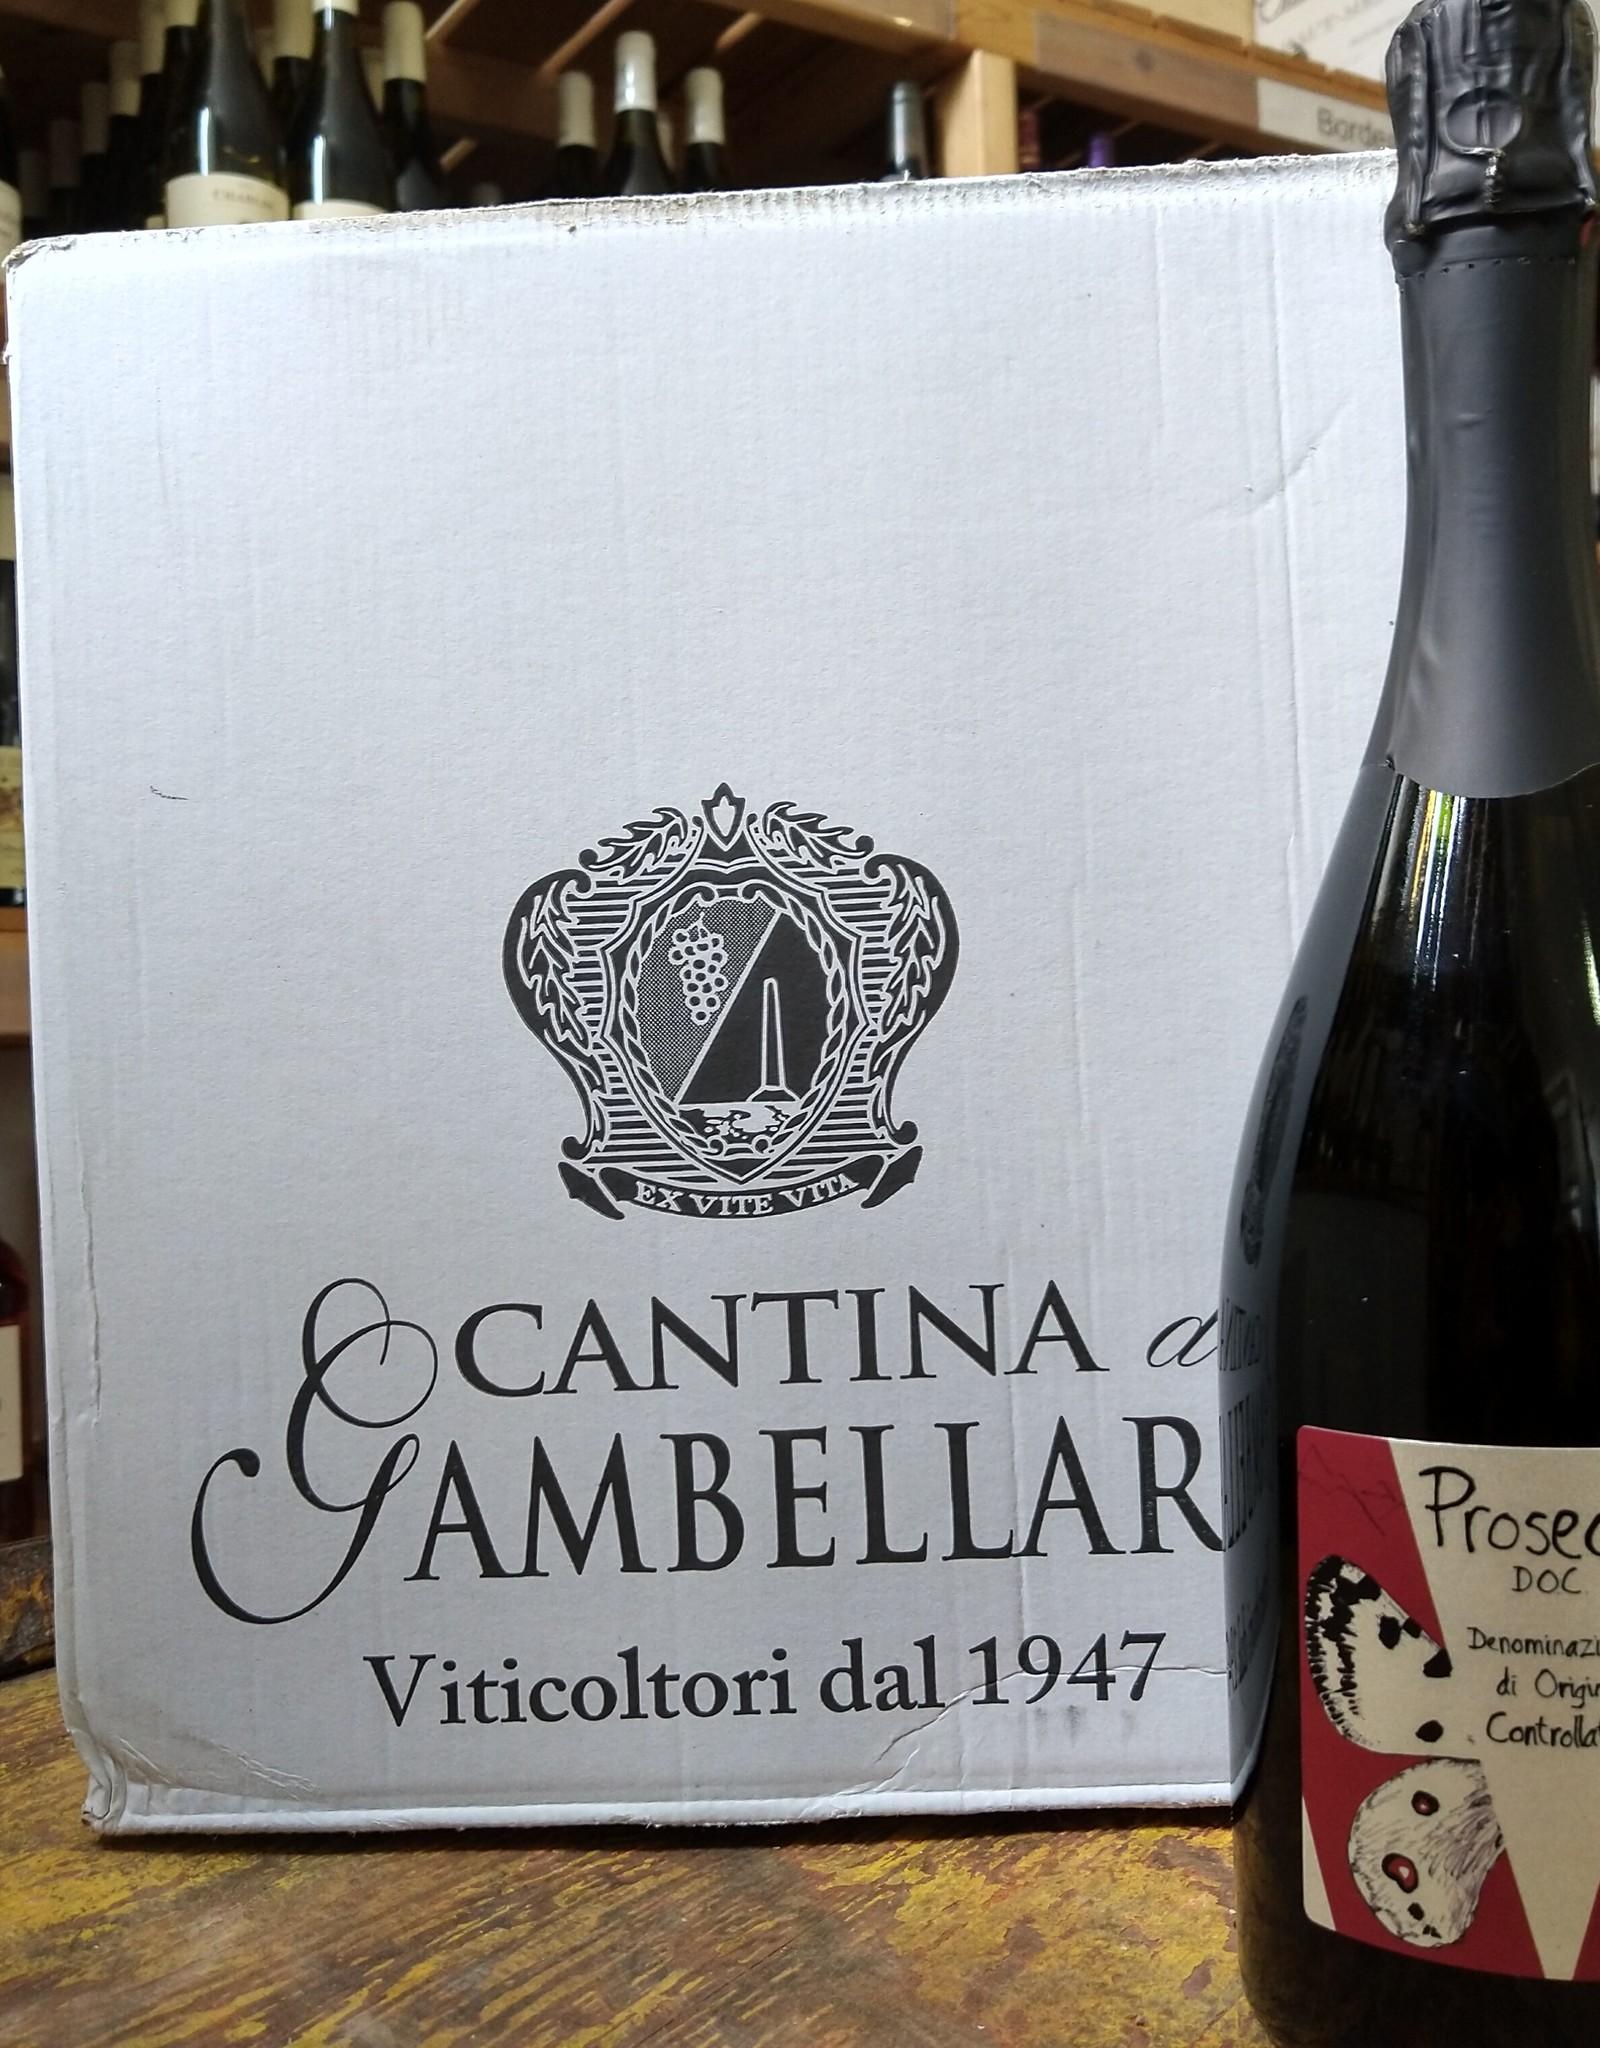 Case Deal £60 - Just £10 per bottle (retail £11.99) 6 x V Prosecco DOC Spumante